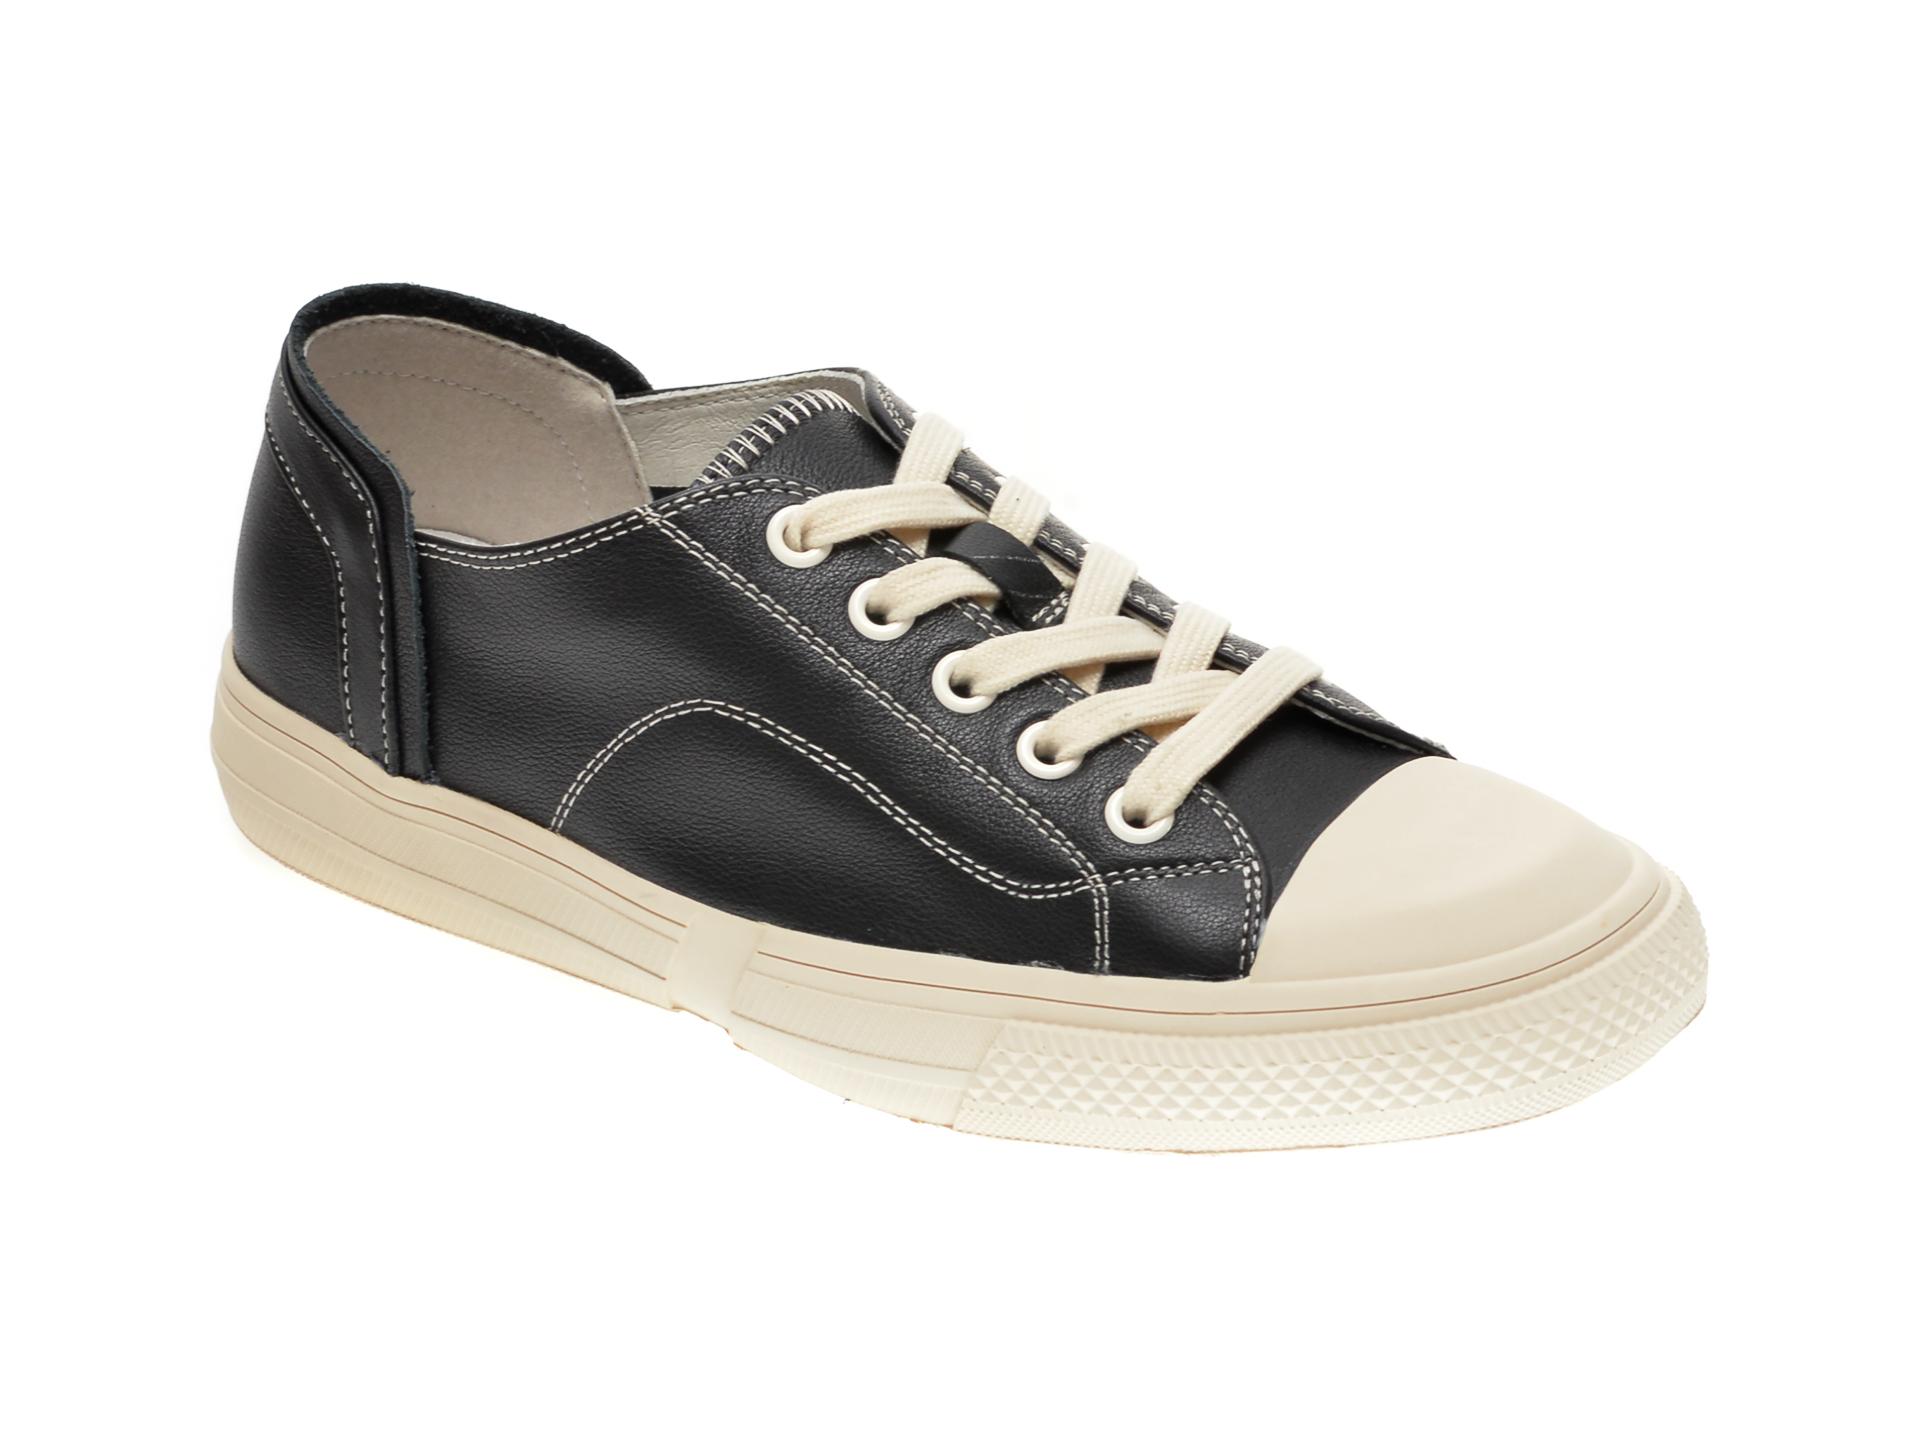 Pantofi sport GRYXX negri, 6611, din piele naturala